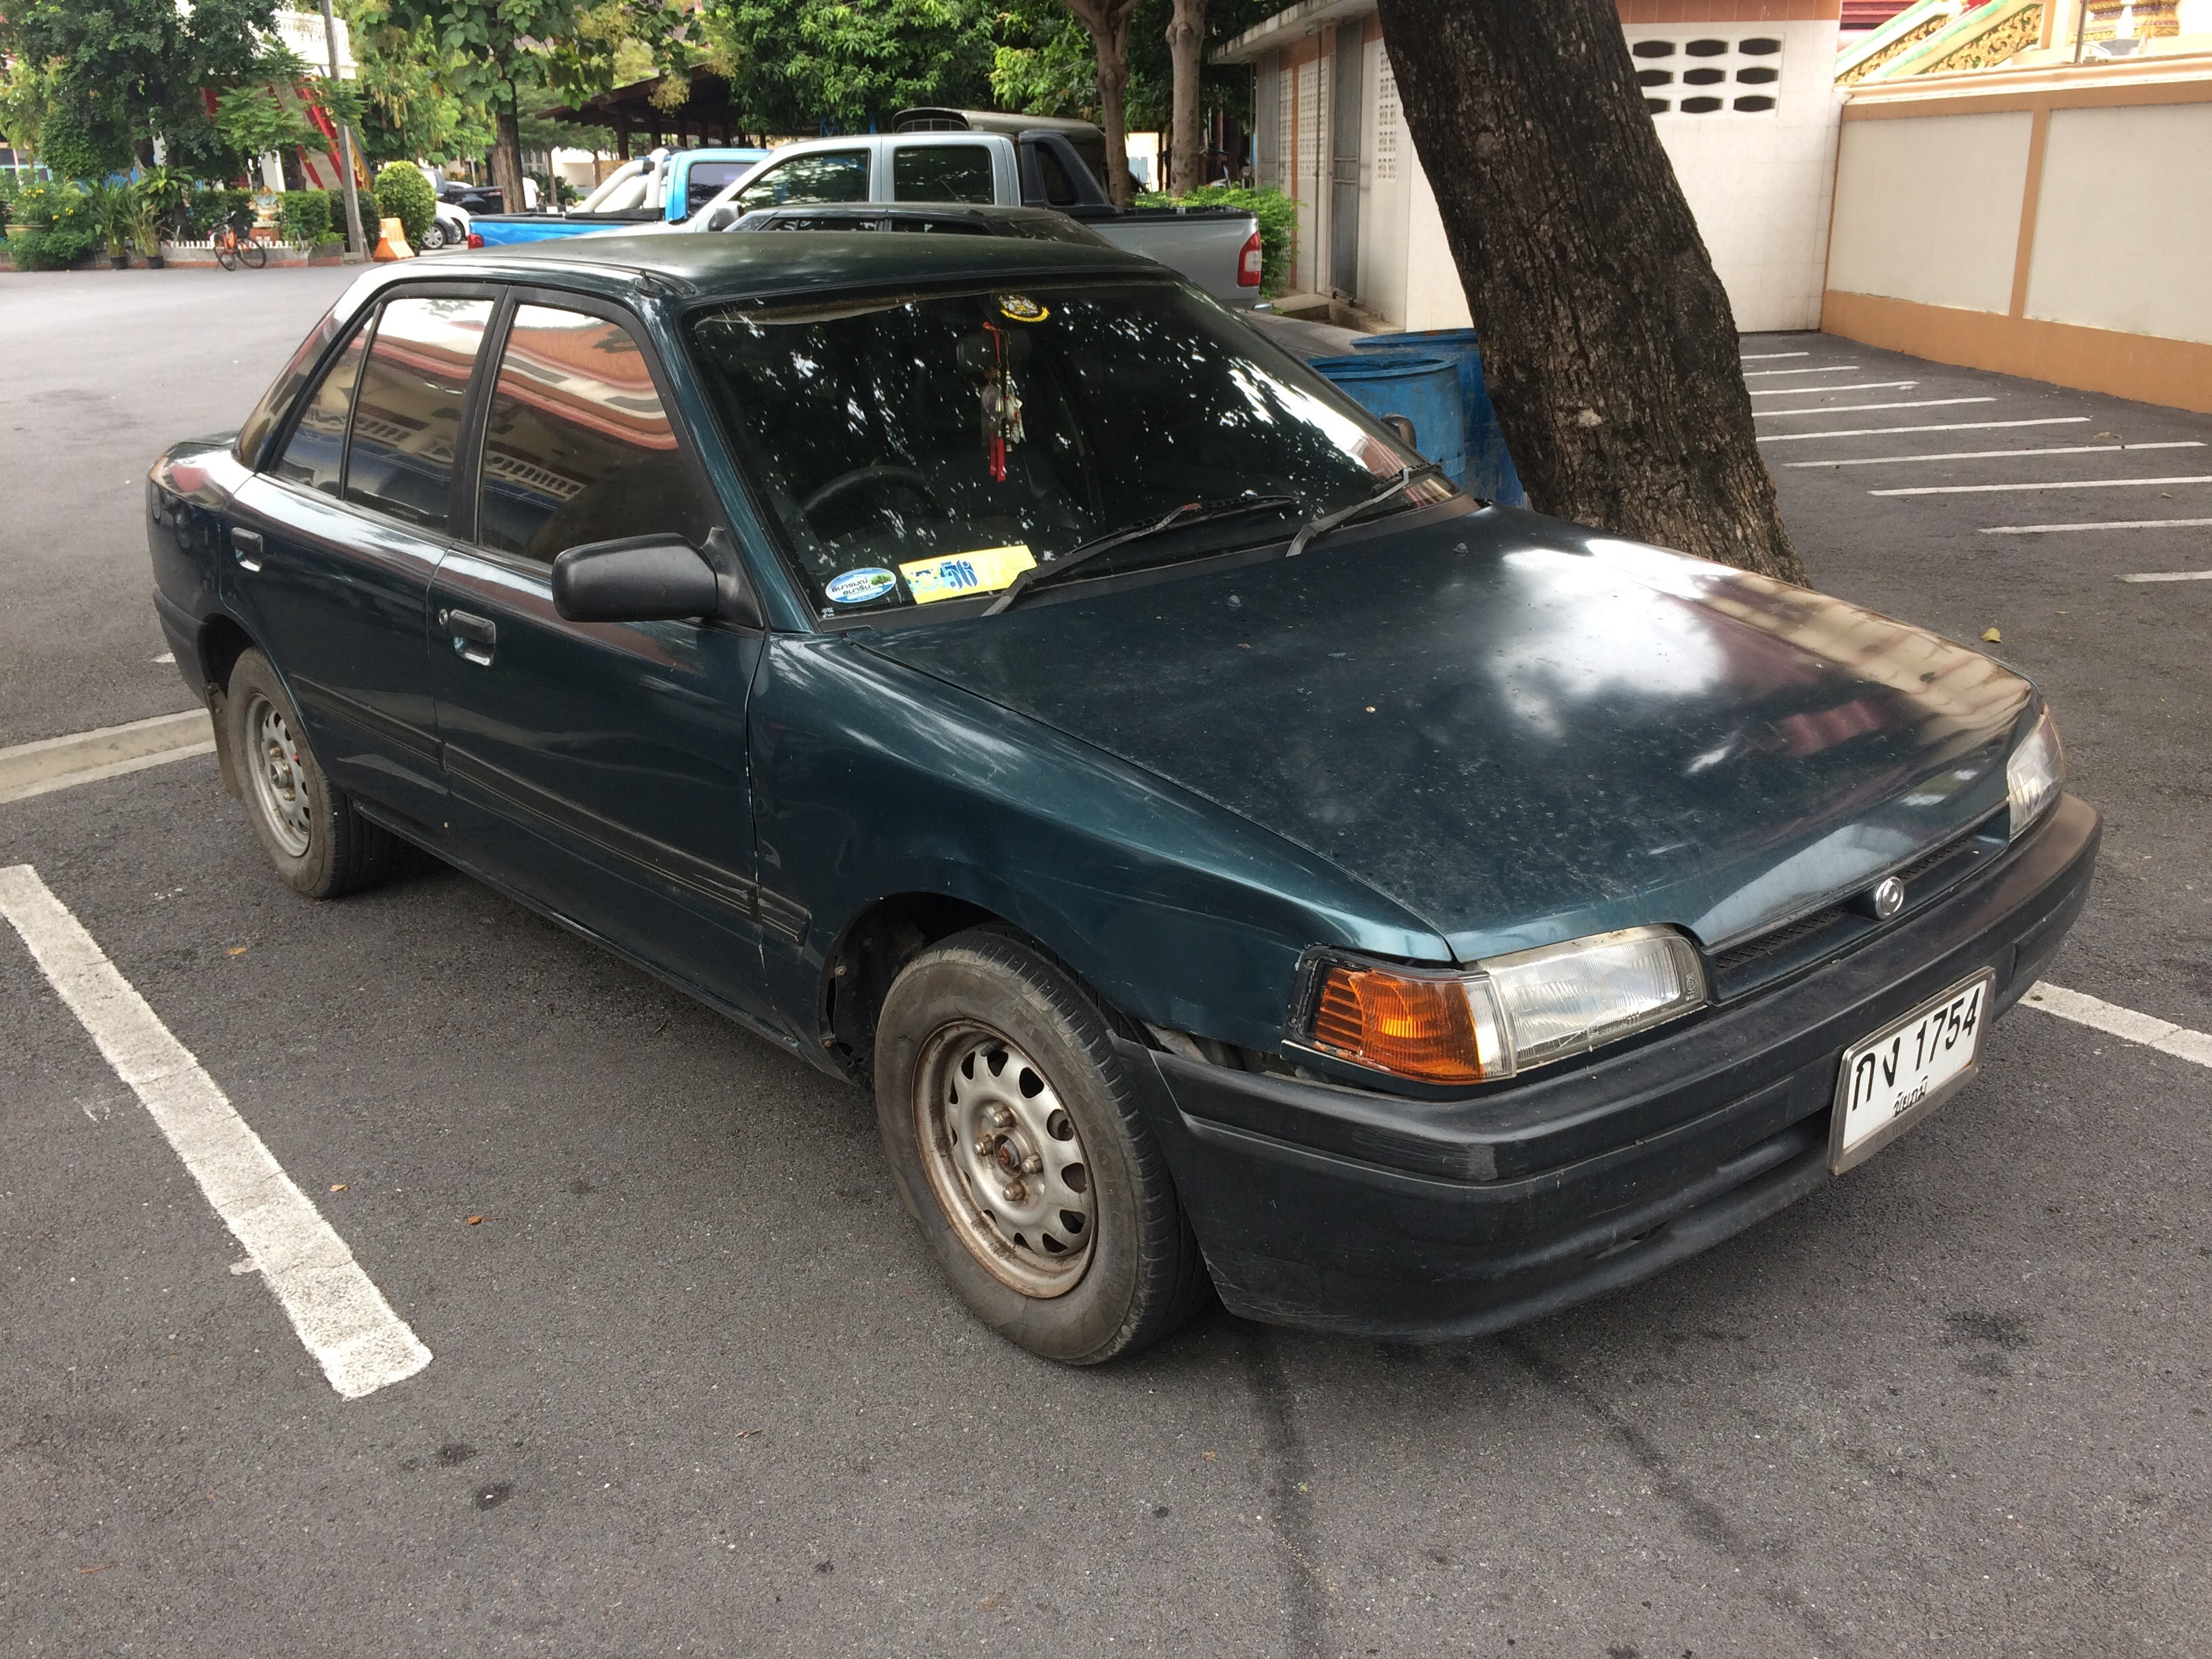 File 1992 1993 Mazda 323 Bg Sedan 13 10 2017 01 Jpg Wikimedia